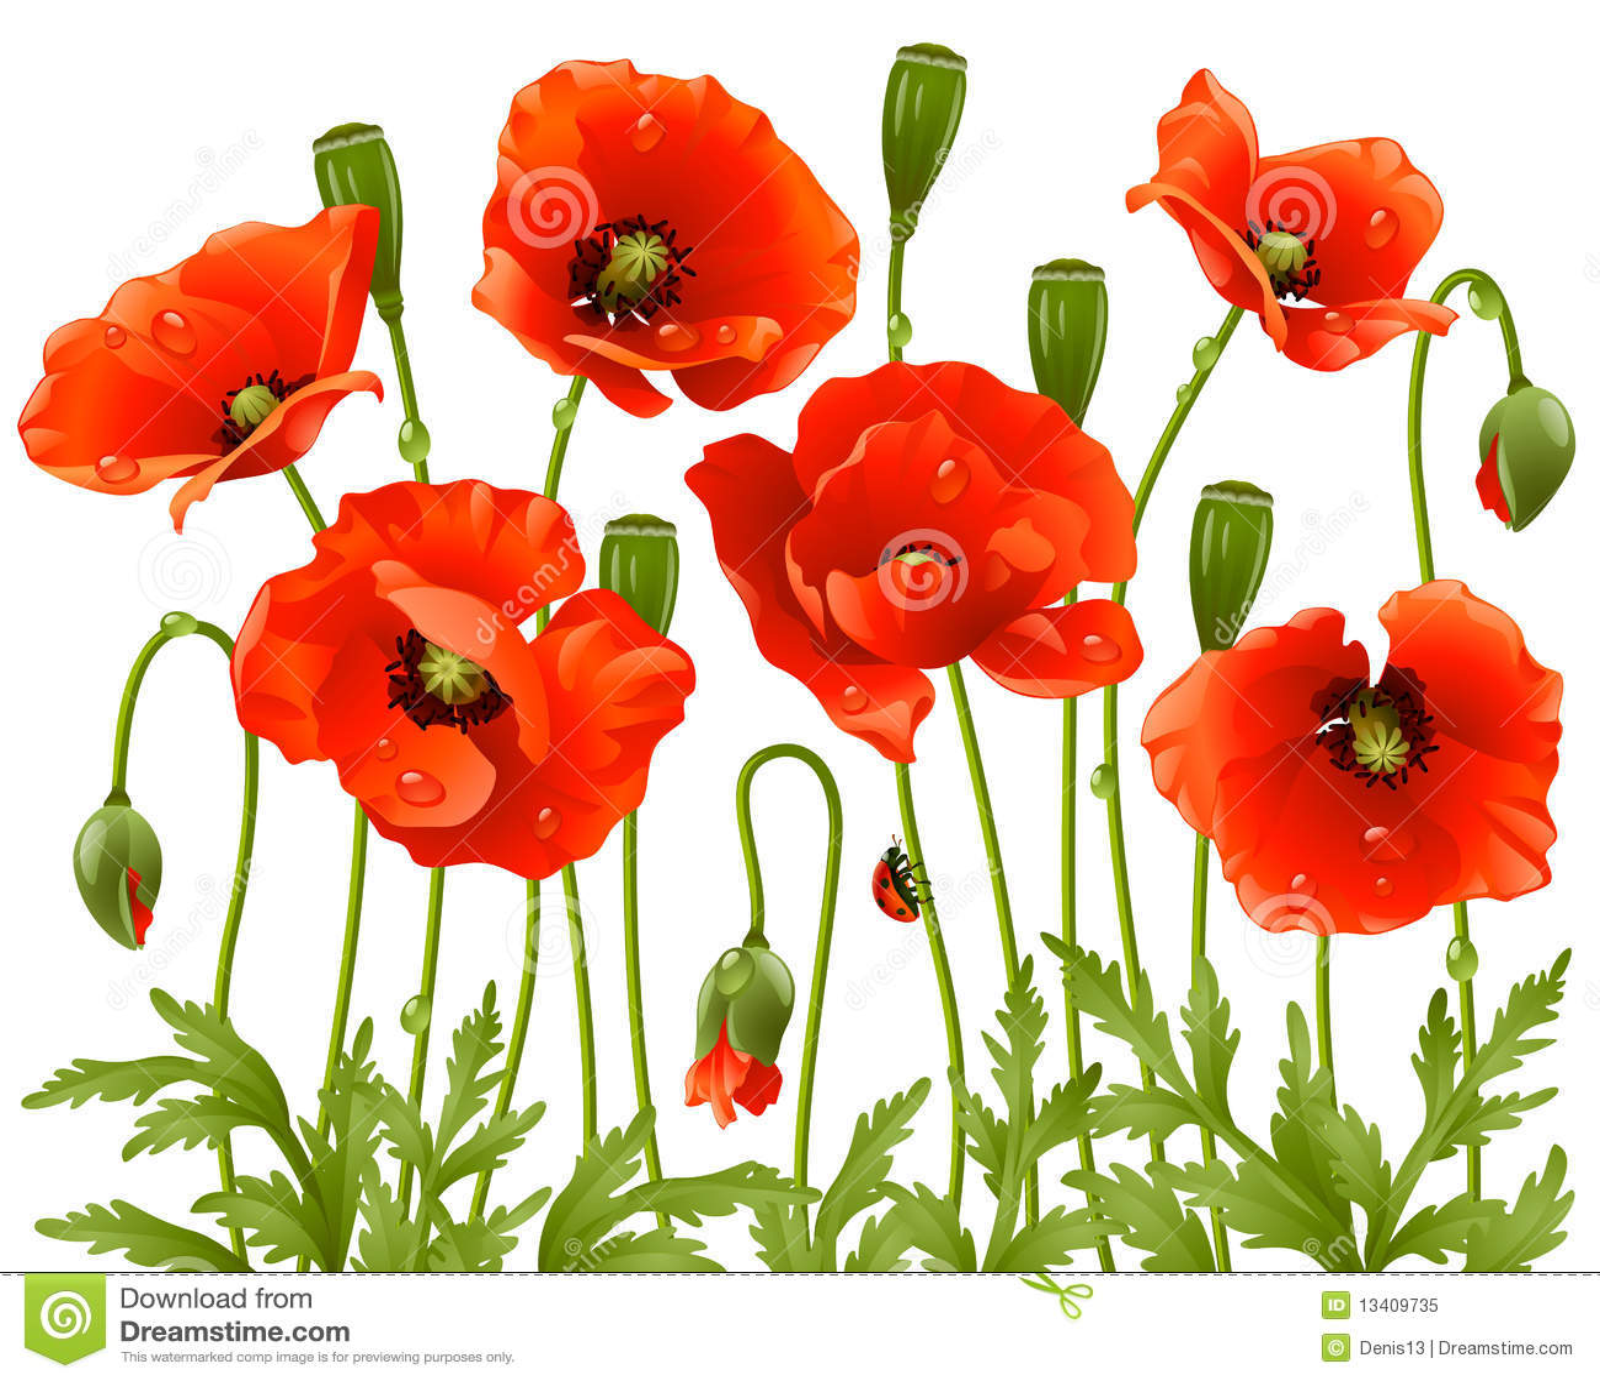 Spring flowers poppy royalty free stock photo image for Decoraciones para hojas